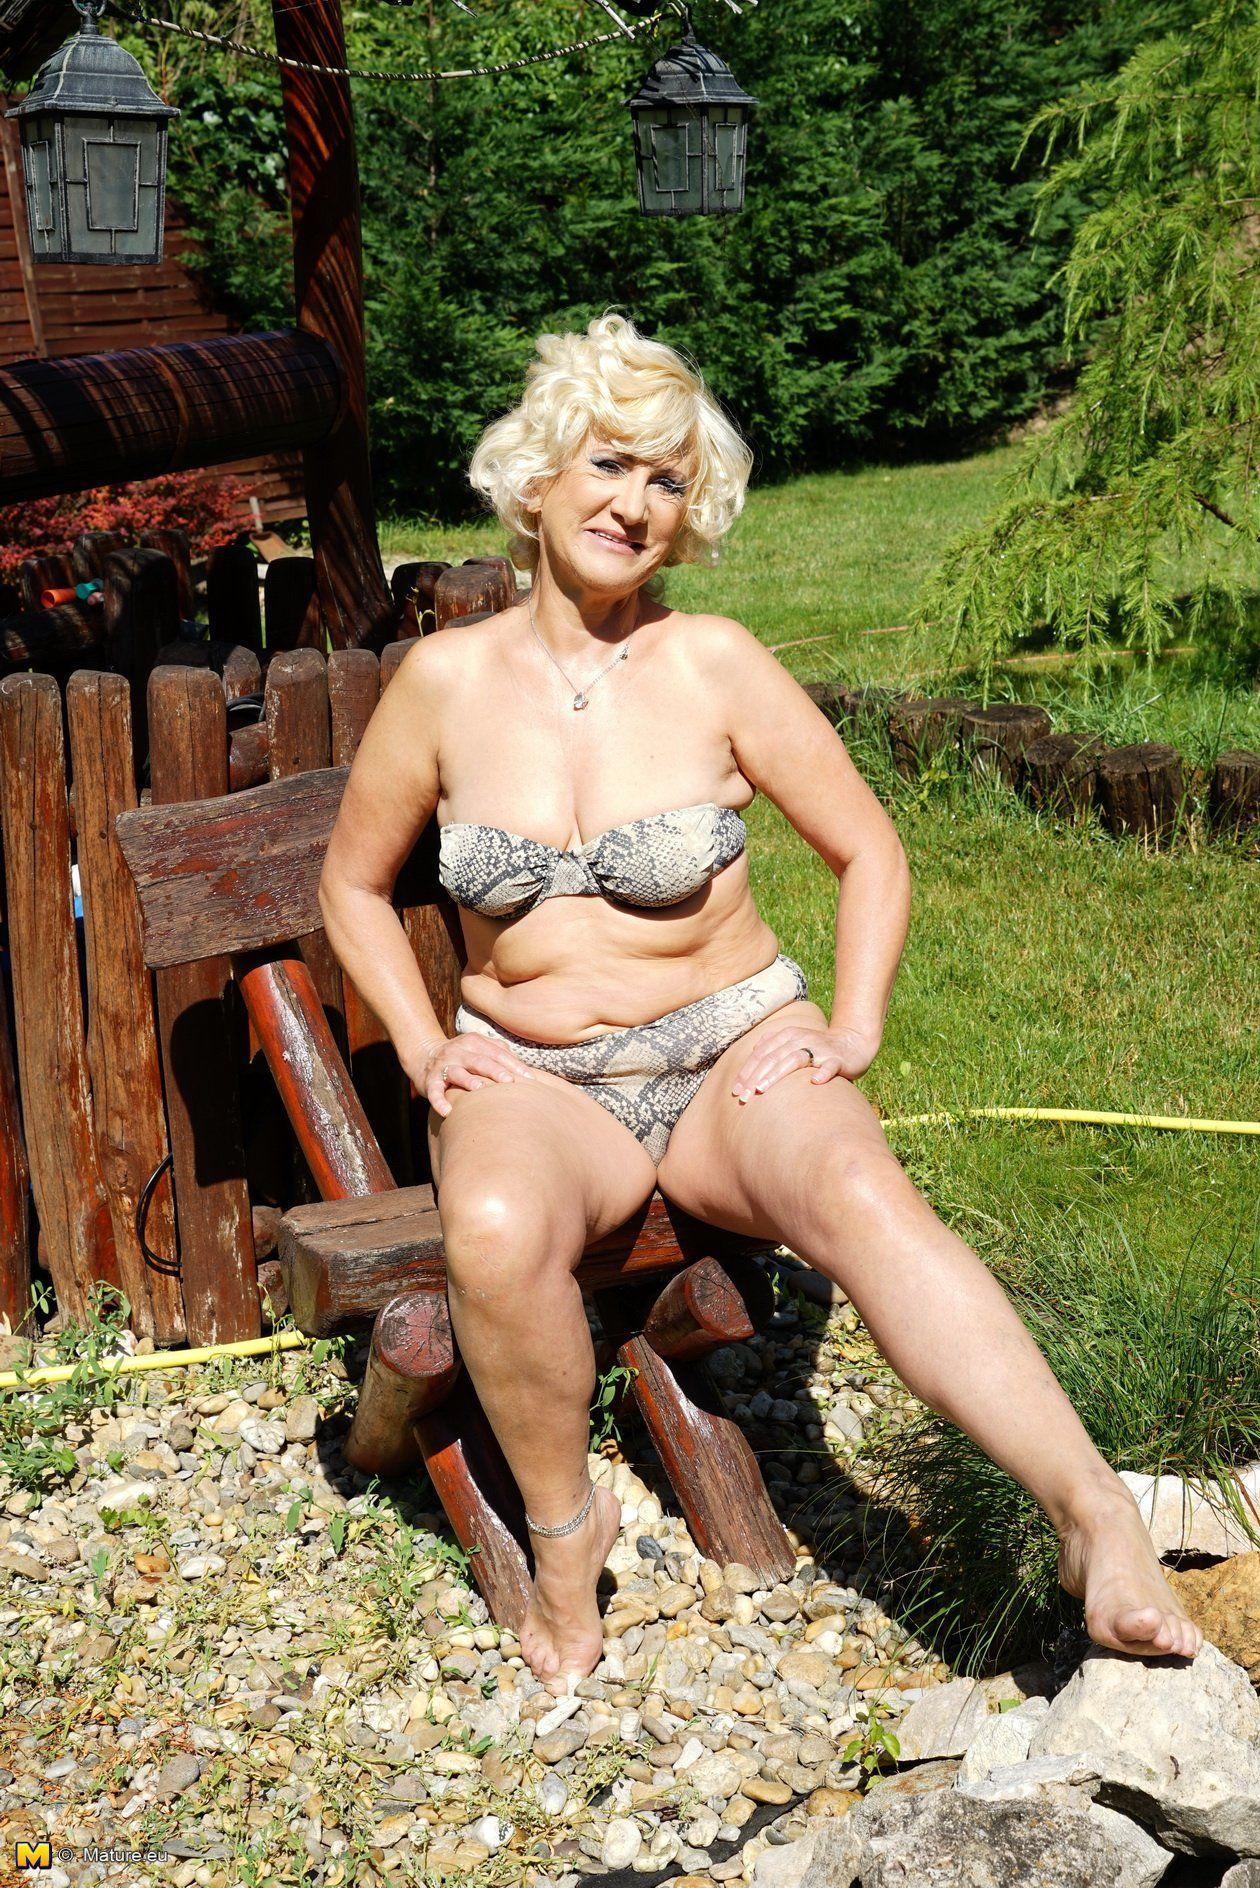 Mature outdoor woman